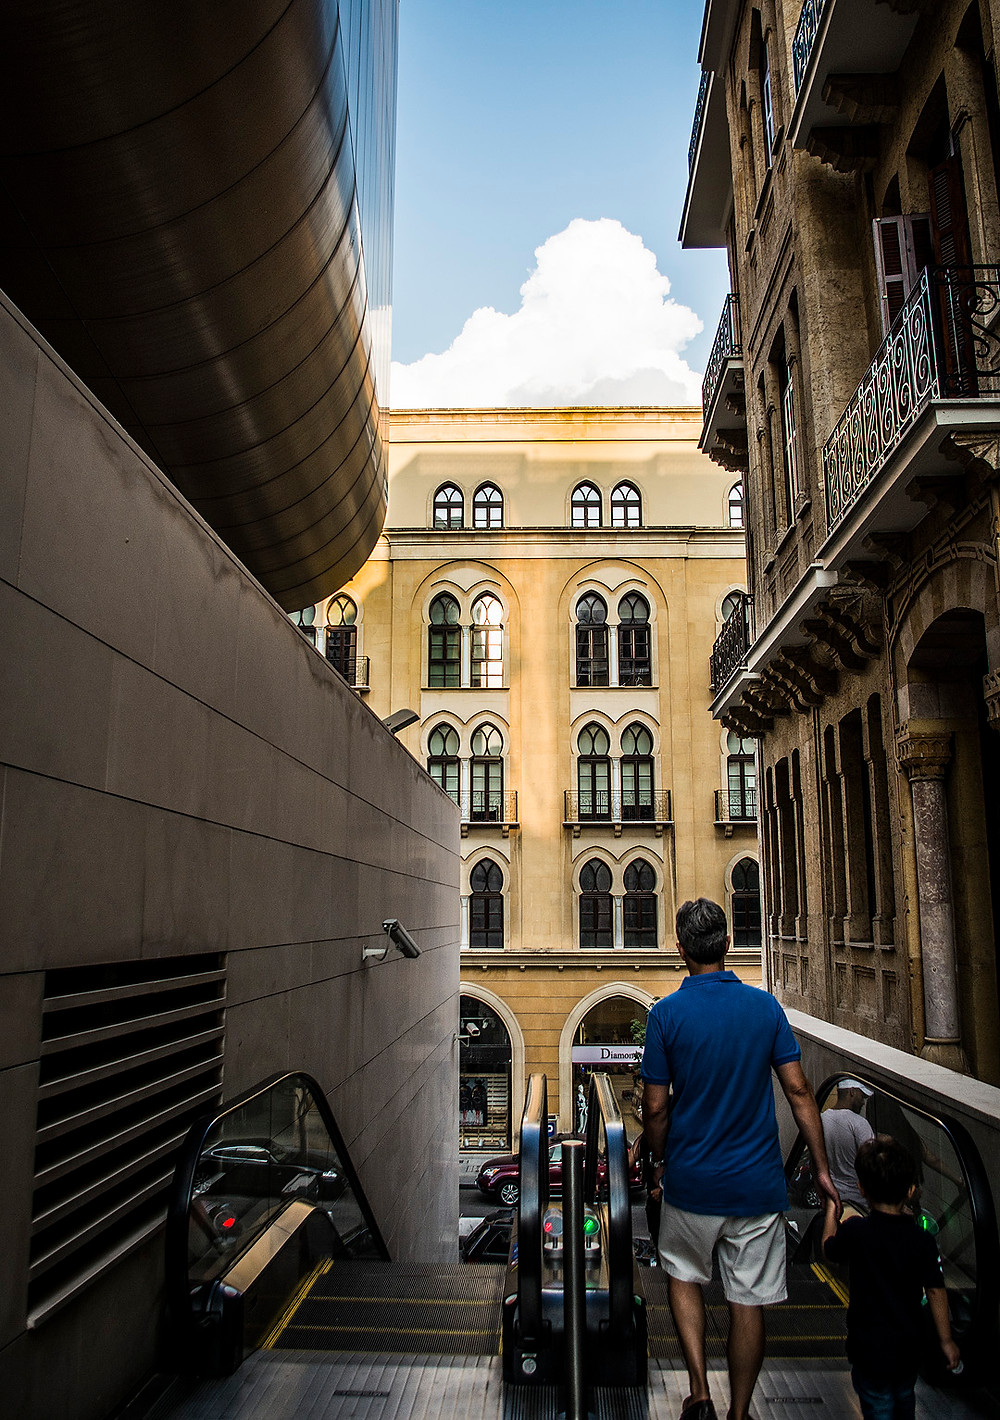 Escalator at Beirut Souks